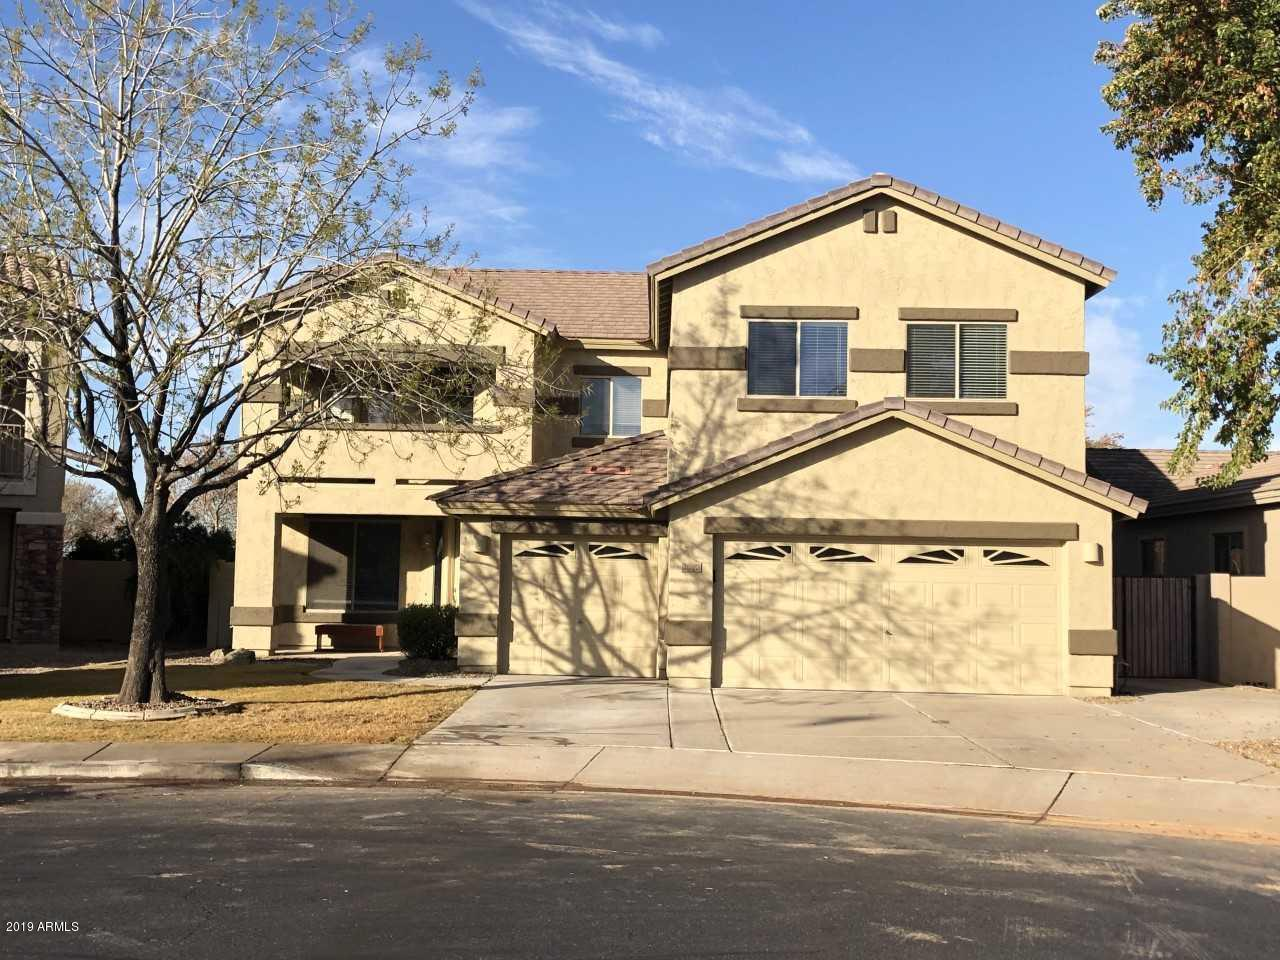 Photo of 2070 S HOLGUIN Place, Chandler, AZ 85286